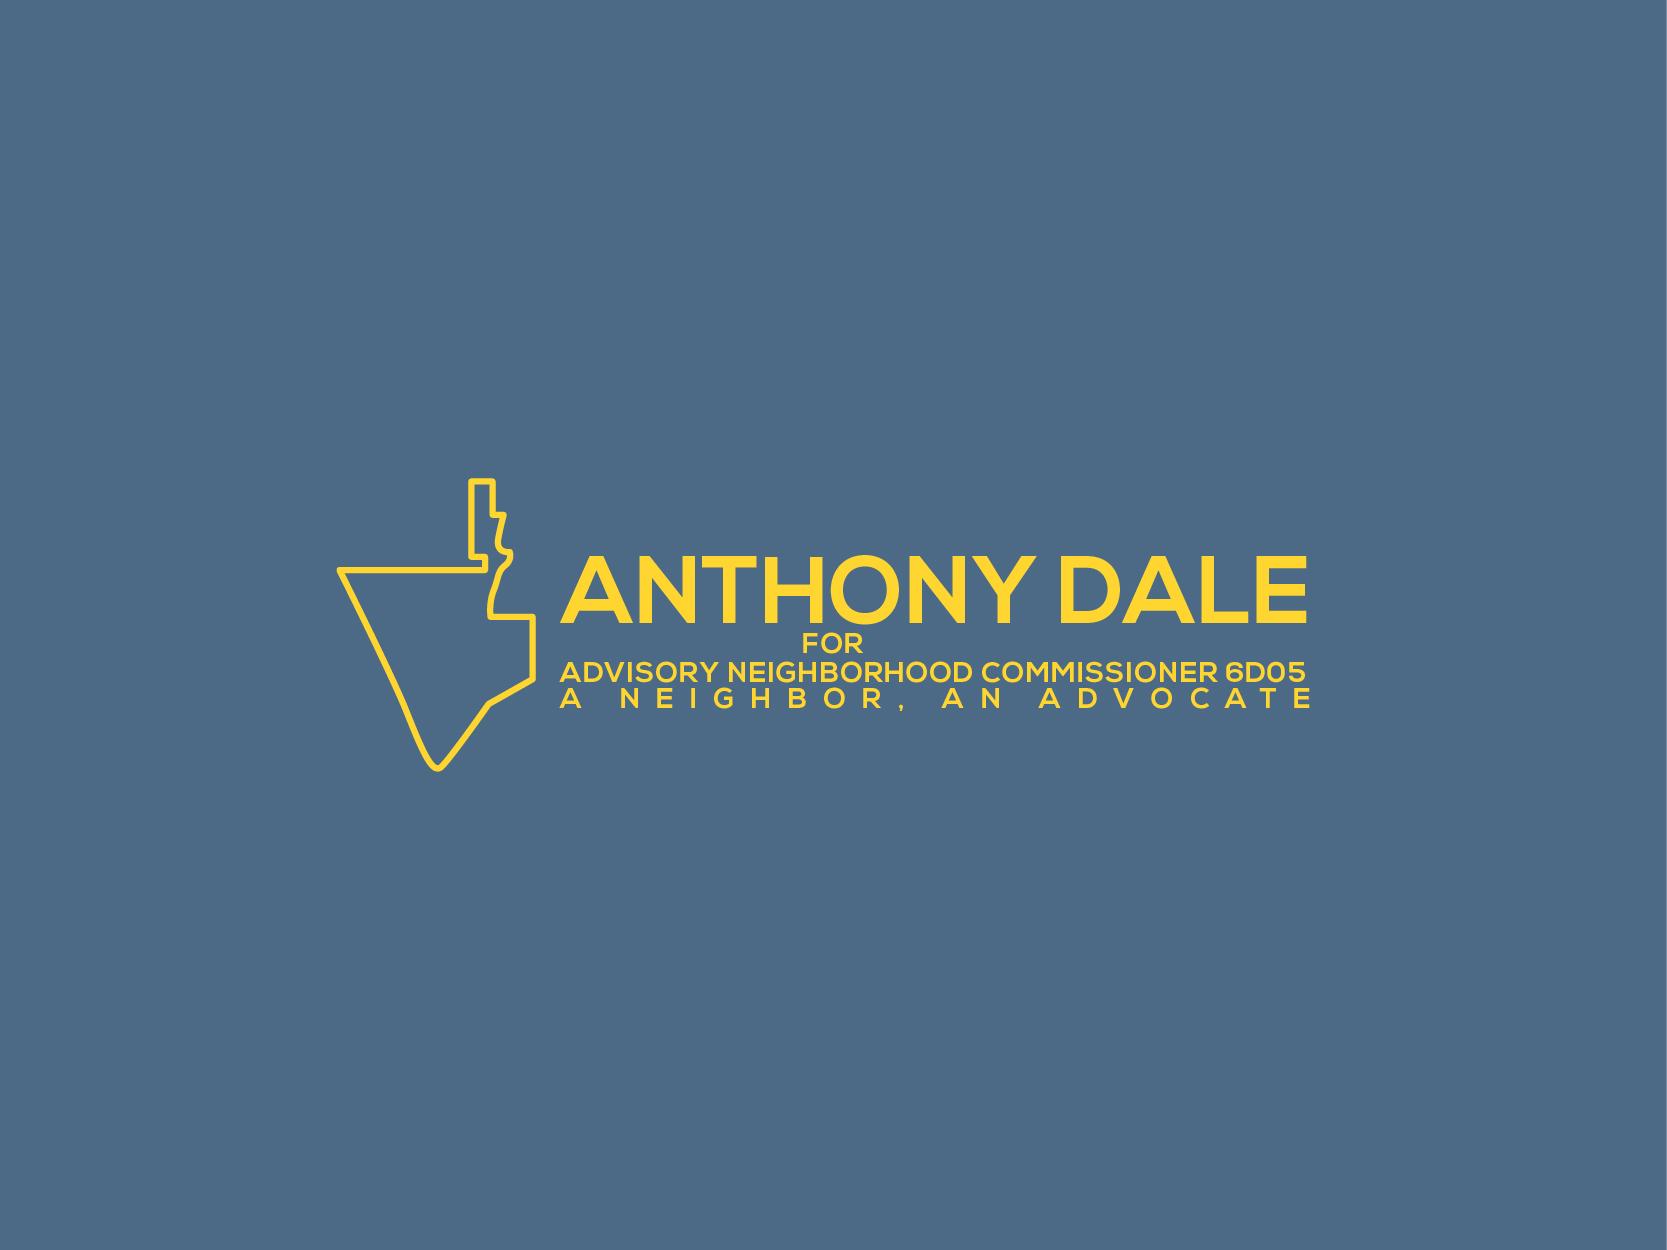 Anthony Dale